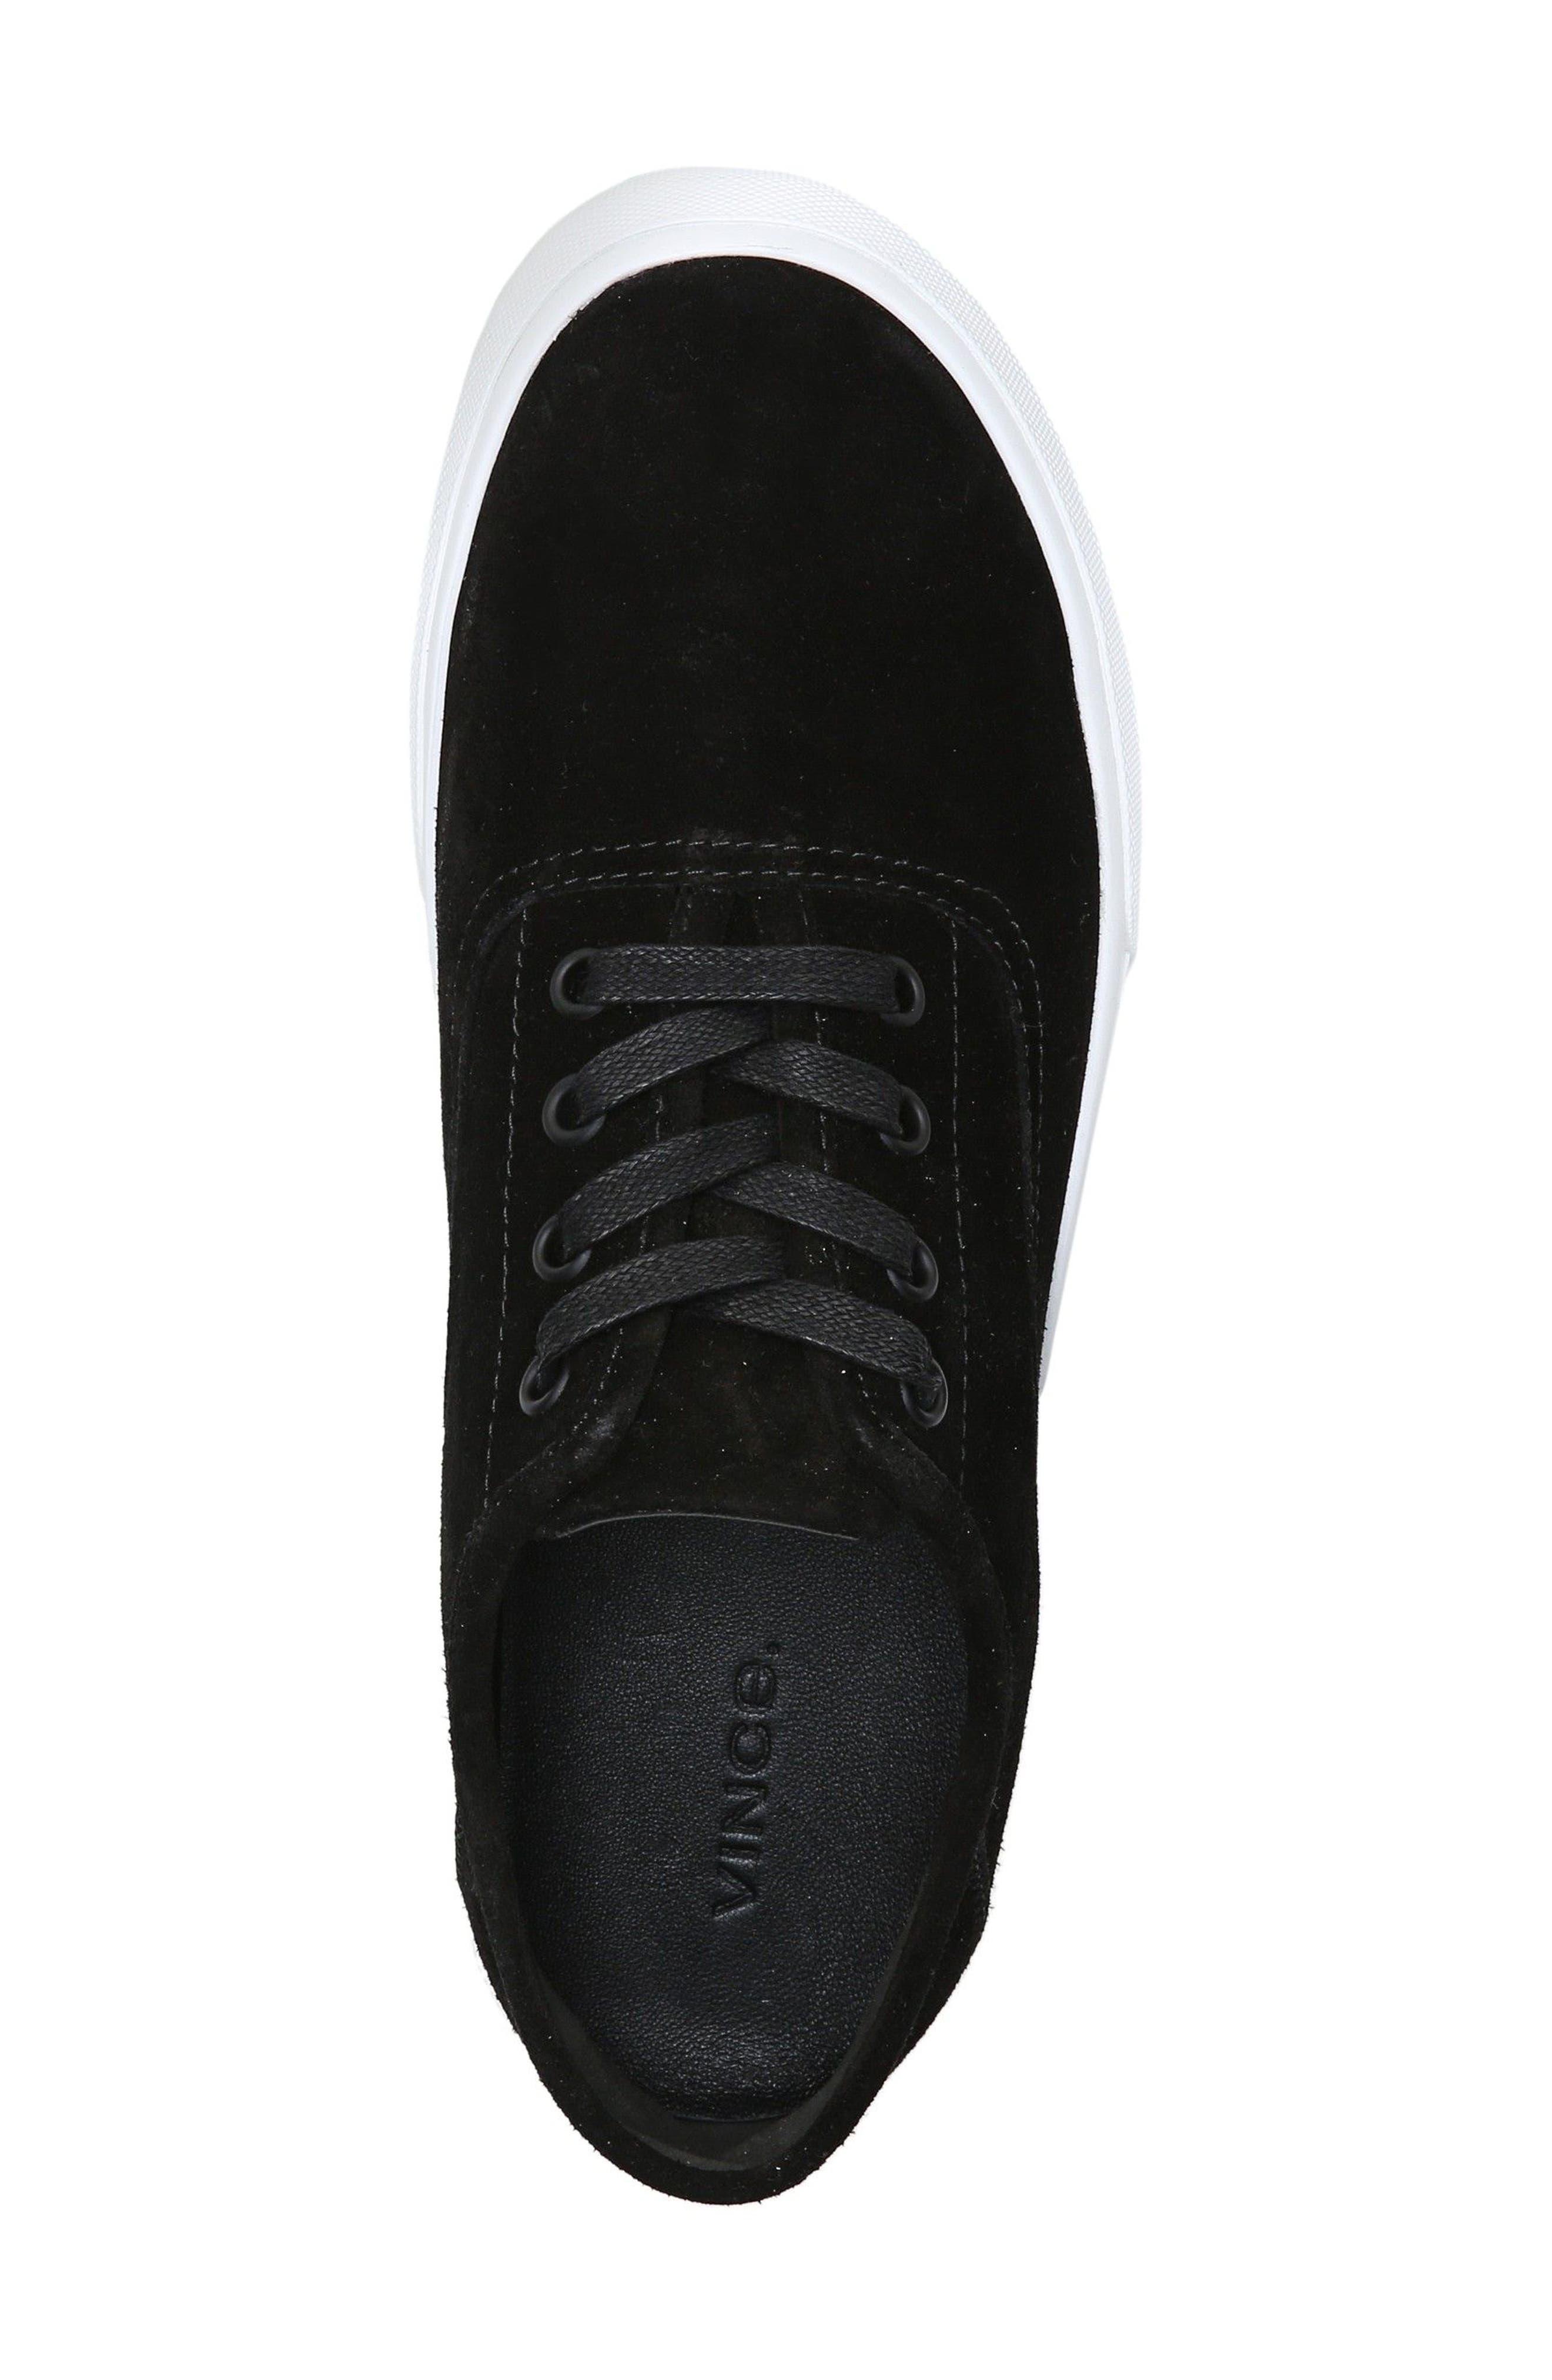 Copley Platform Sneaker,                             Alternate thumbnail 5, color,                             001